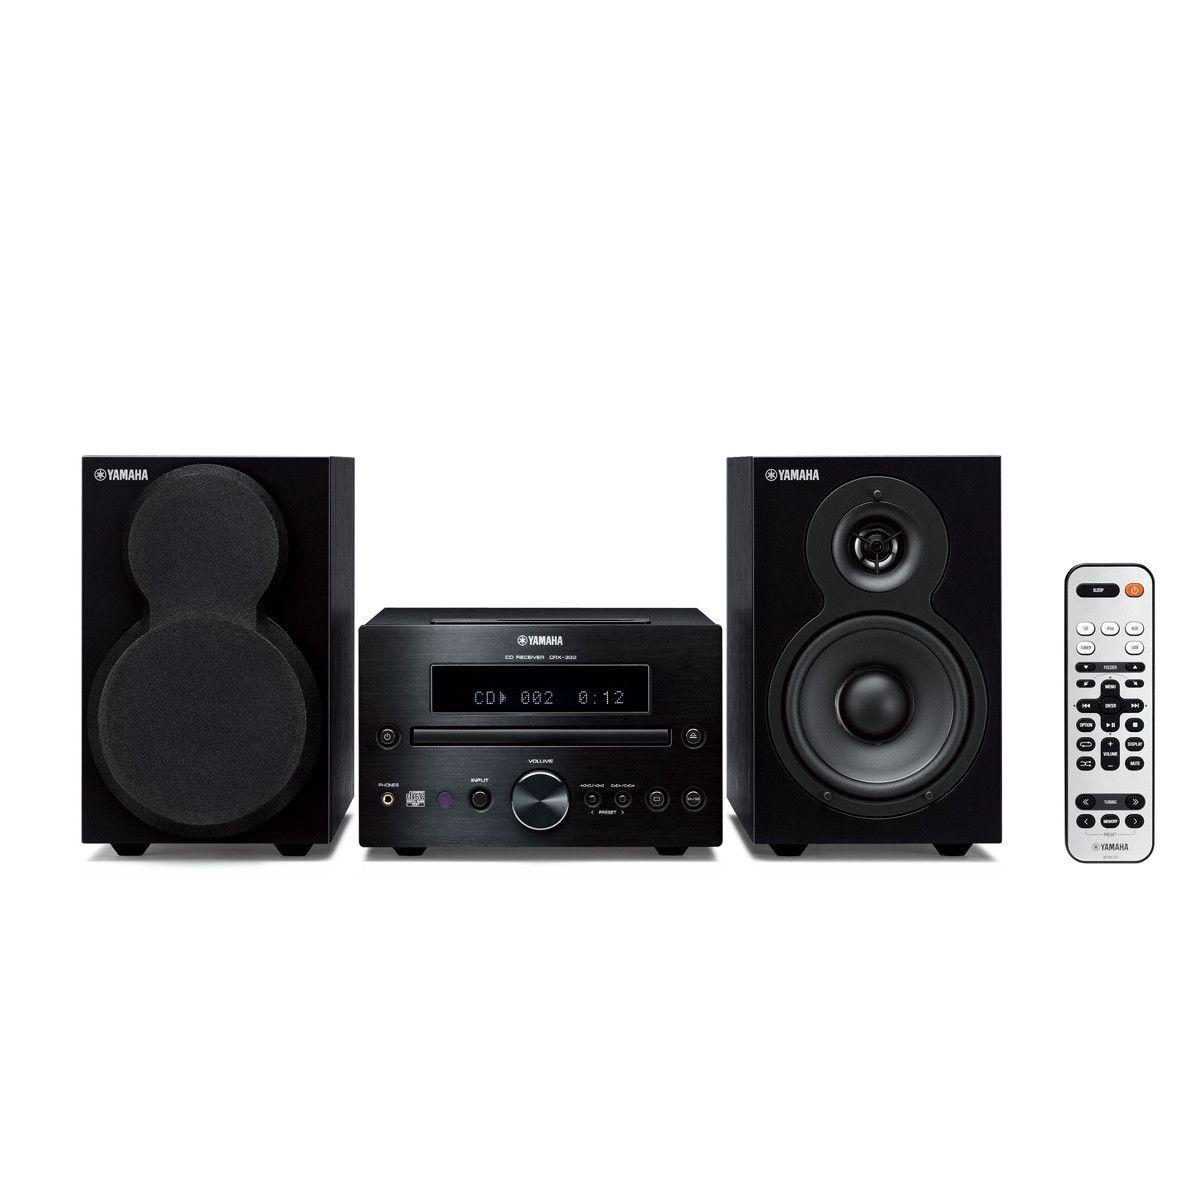 Yamaha Mcr 232 Micro Component System Stereo Systems Yamaha Audio System